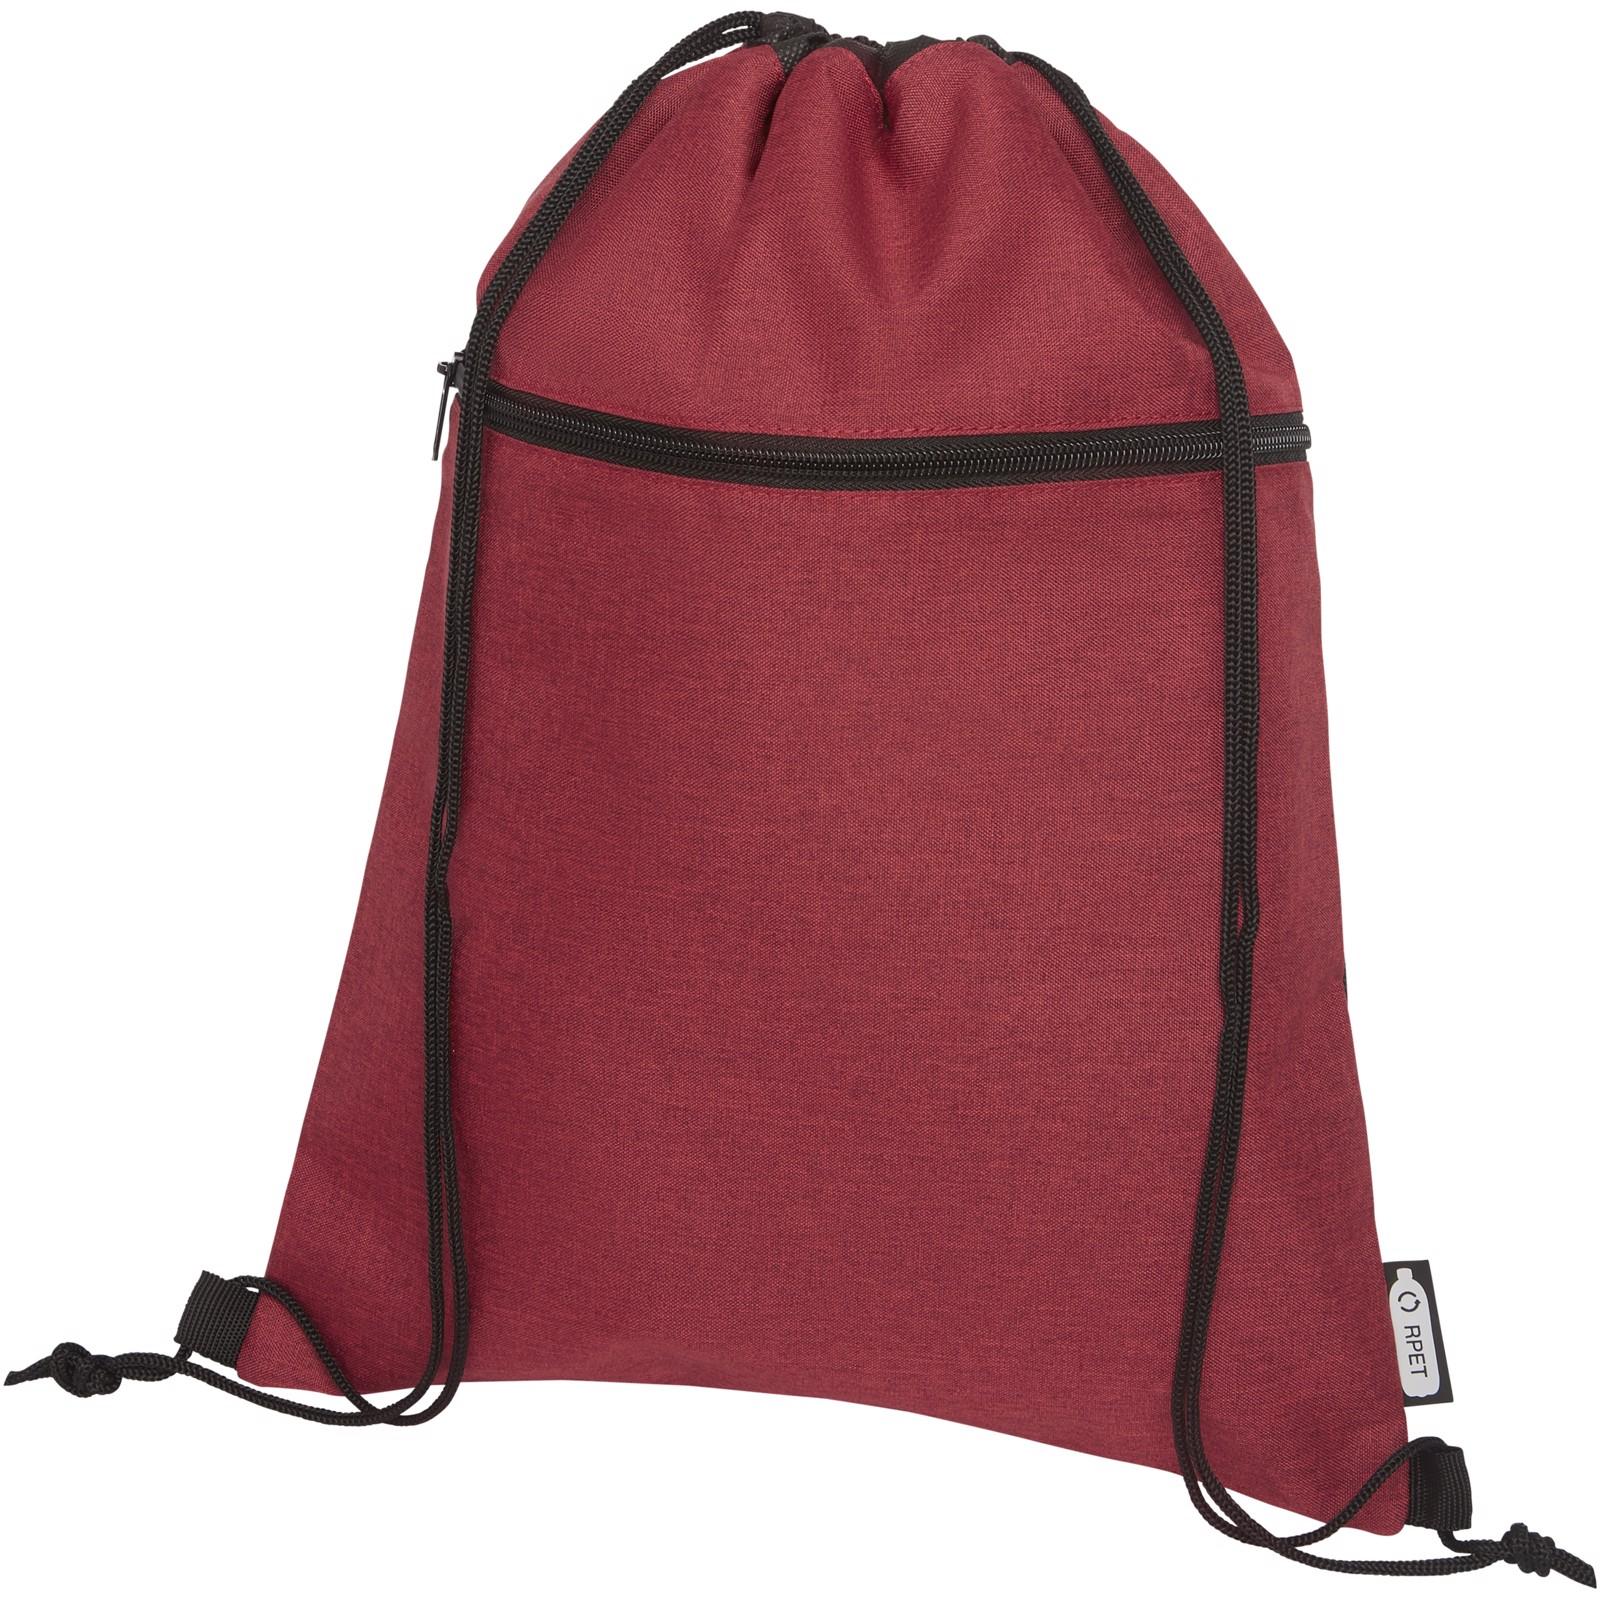 Ross RPET drawstring backpack - Heather dark red